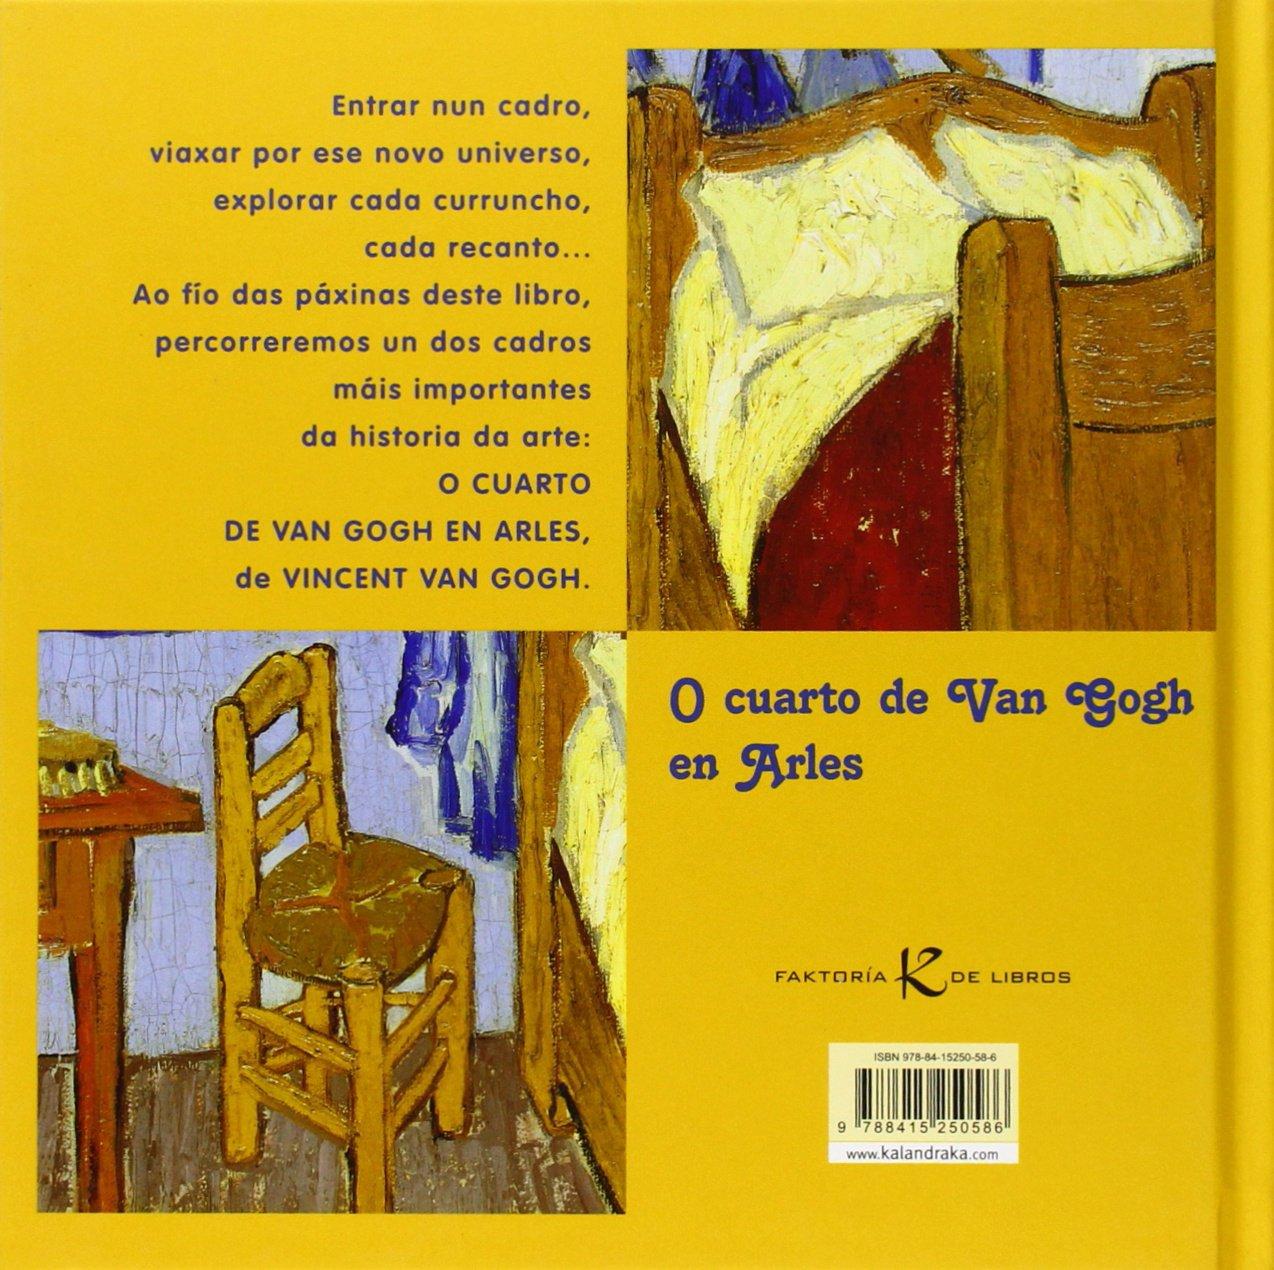 Un cadro de Van Gogh (Arte): Amazon.de: Claire D\'Harcourt ...